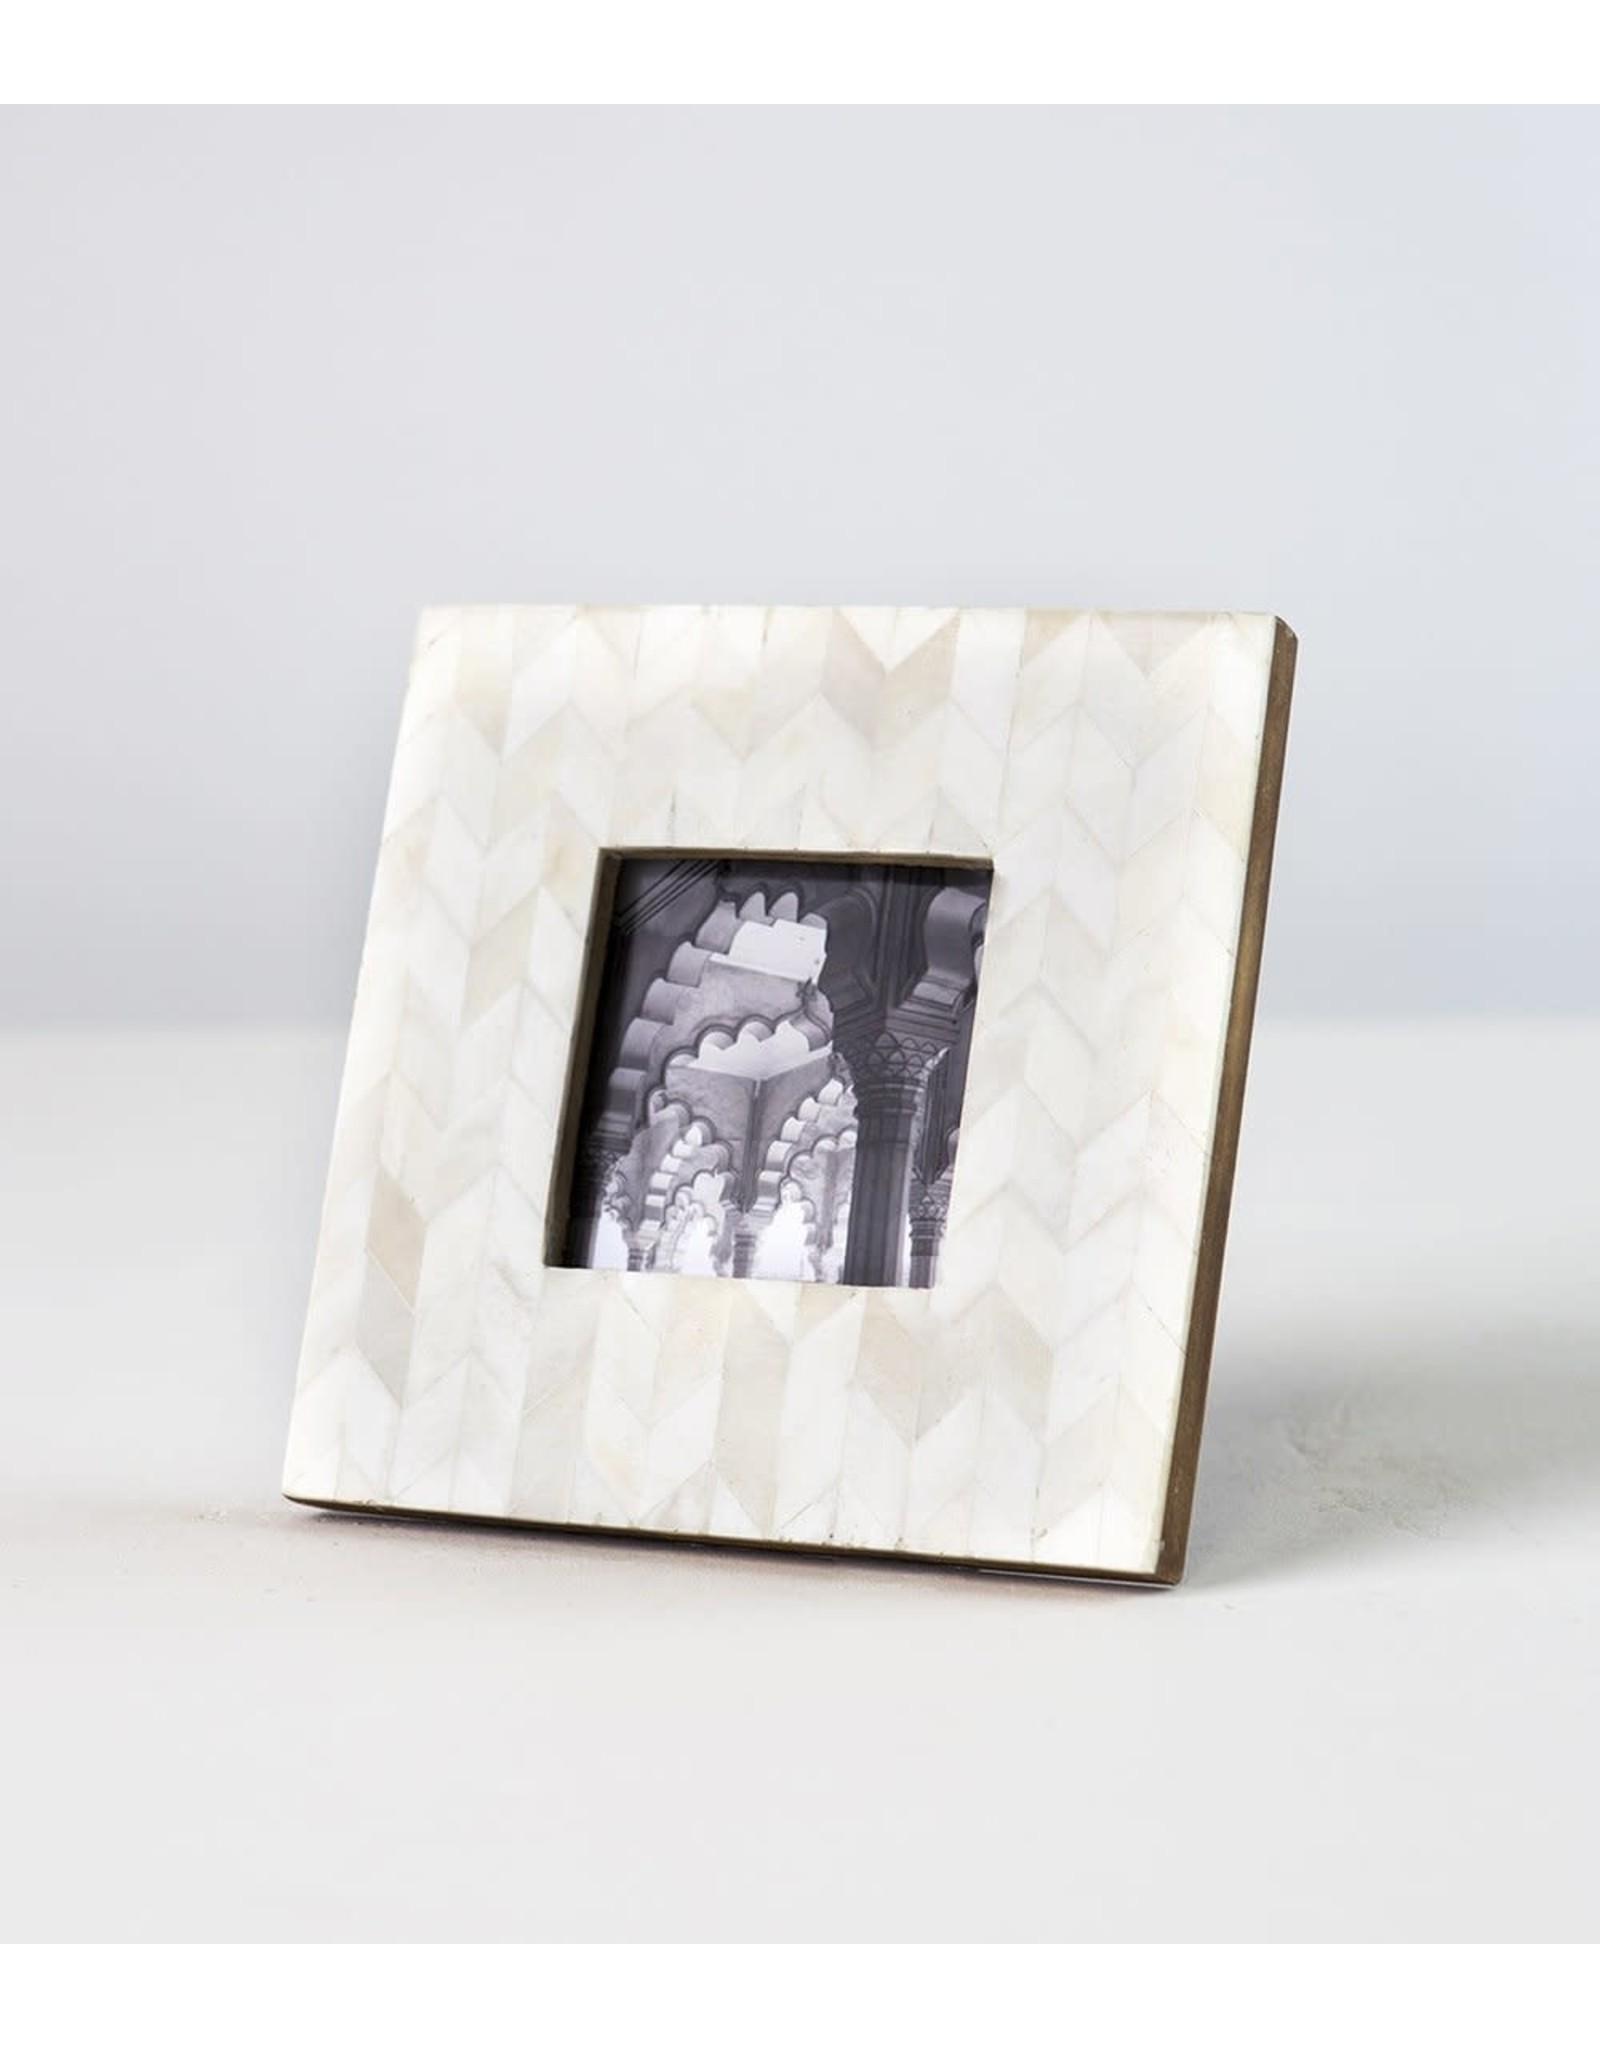 Artemis Pearl Frame, 3 x 3, India